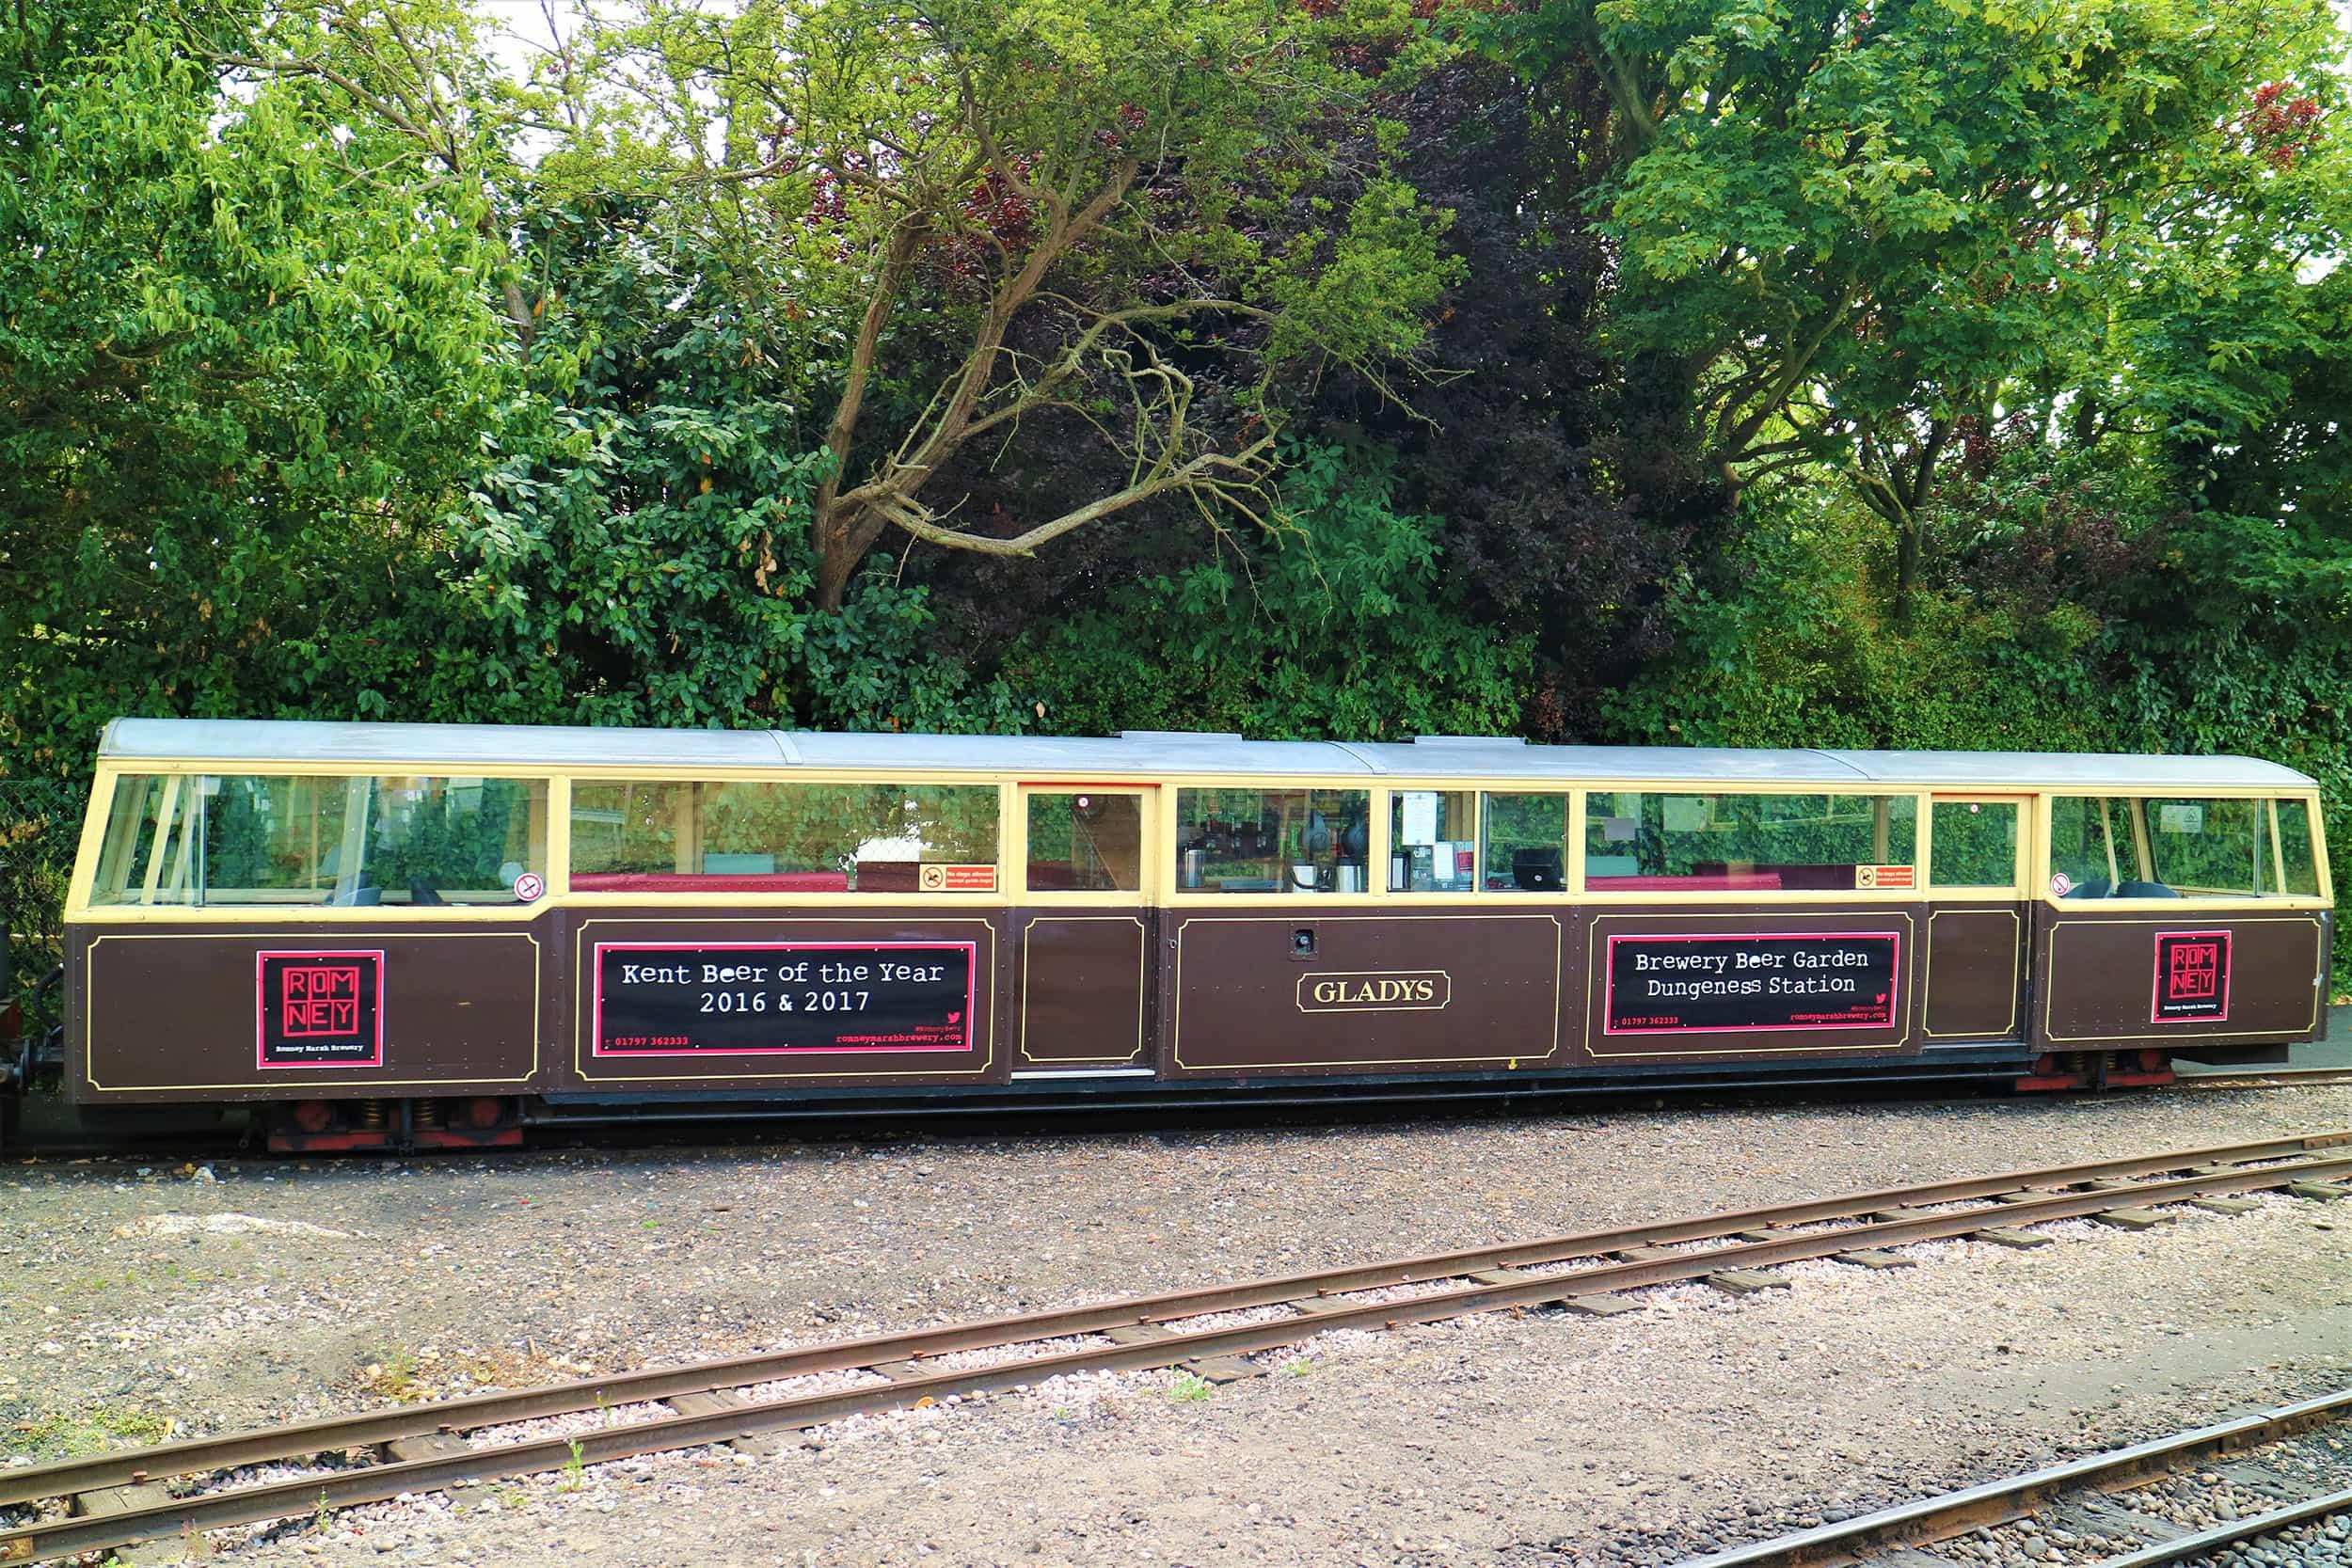 Heritage Carriage - Gladys - Romney, Hythe & Dymchurch Railway